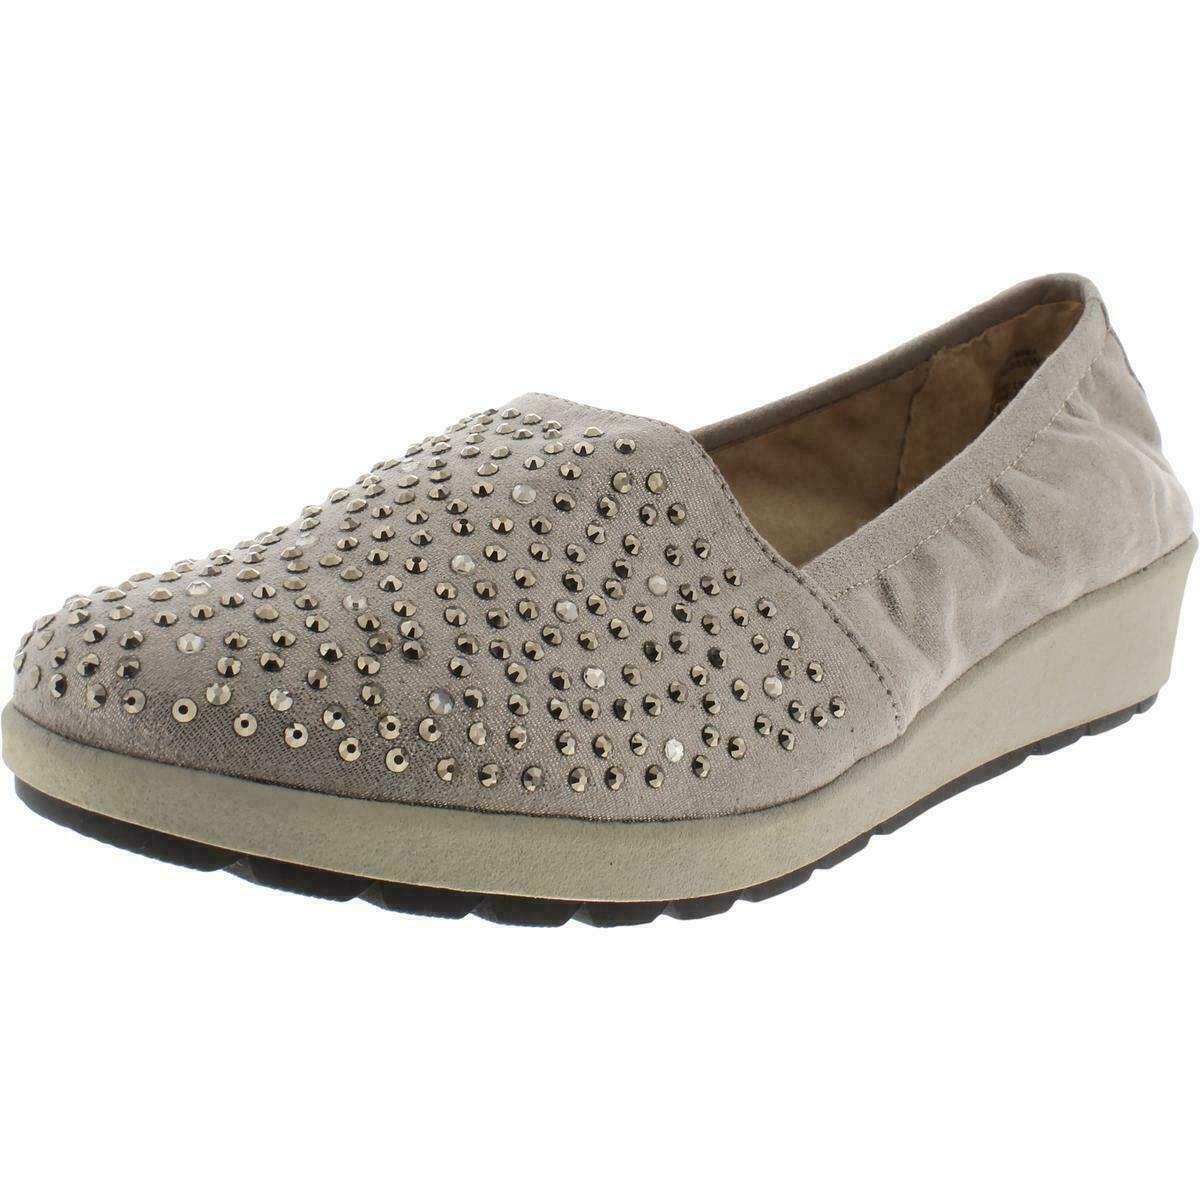 White Mountain Shoes: 40 listings